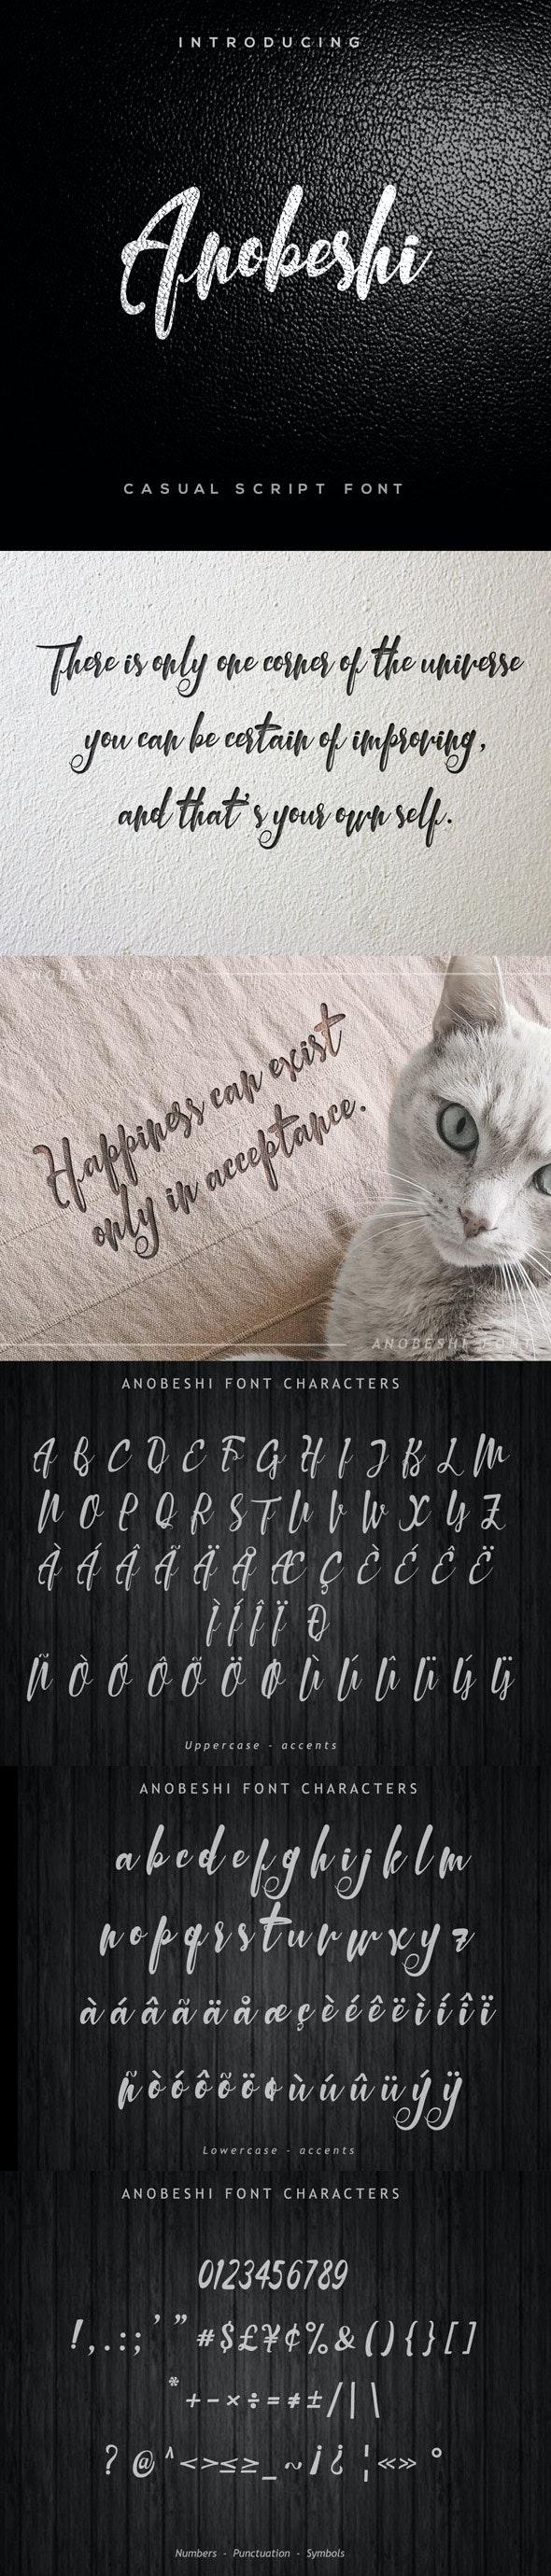 Anobeshi Font - Script Fonts